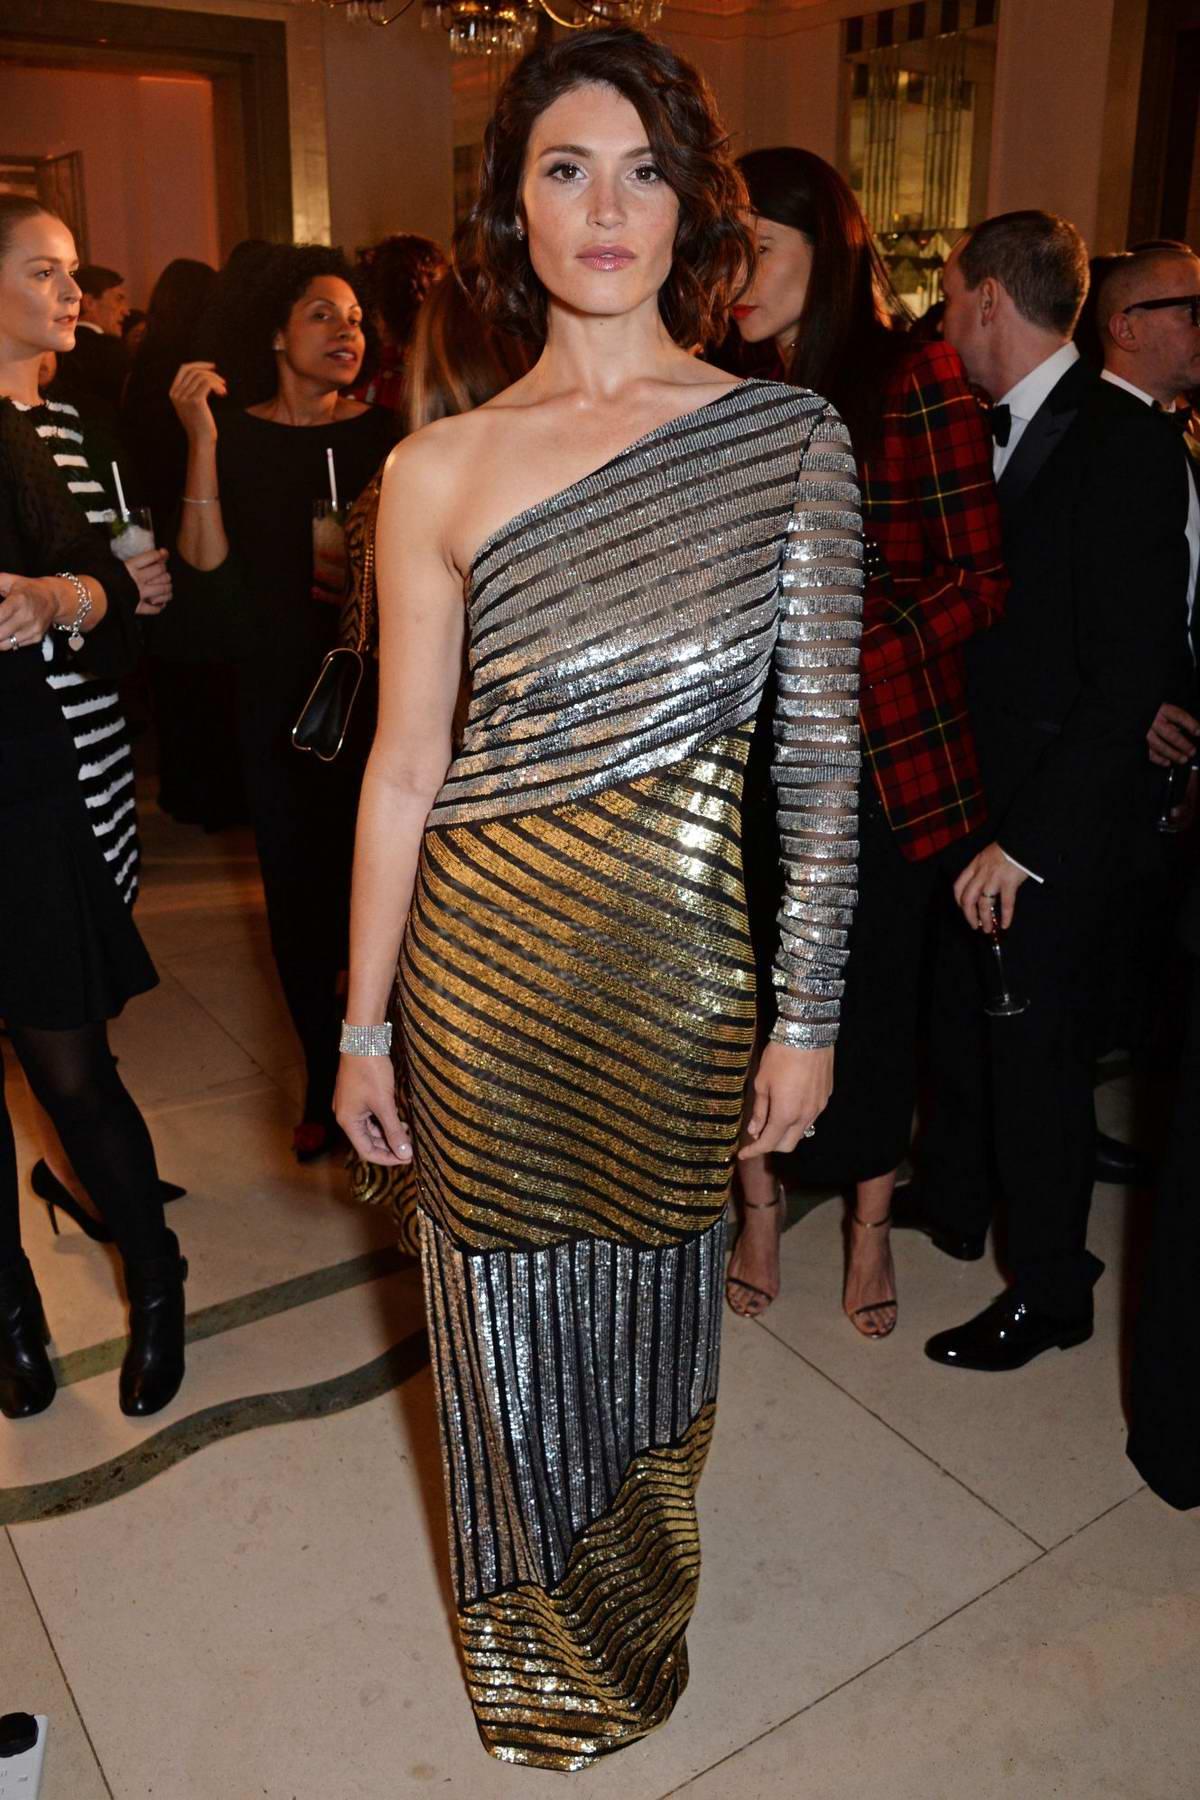 Gemma Arterton attends the Harper's Bazaar Women of the Year Awards 2018 in London, UK